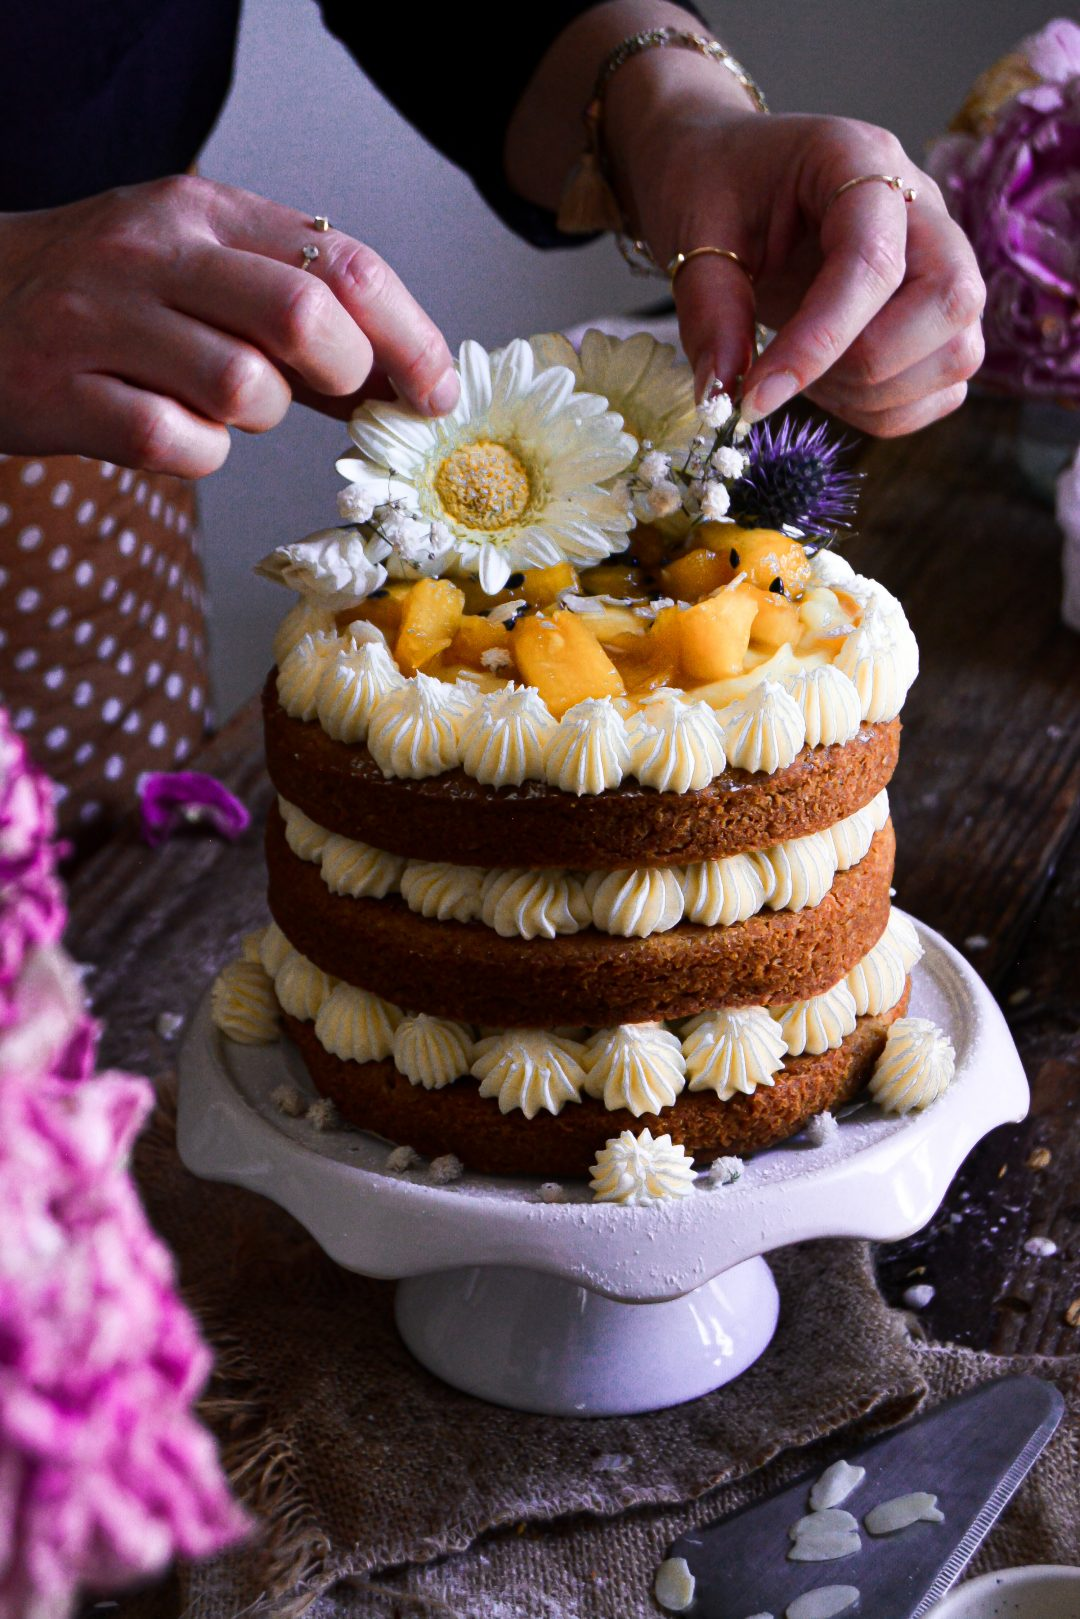 Gâteau Vegan Ananas, Noix de Coco / Vegan Coconut, Pineapple Layer Cake